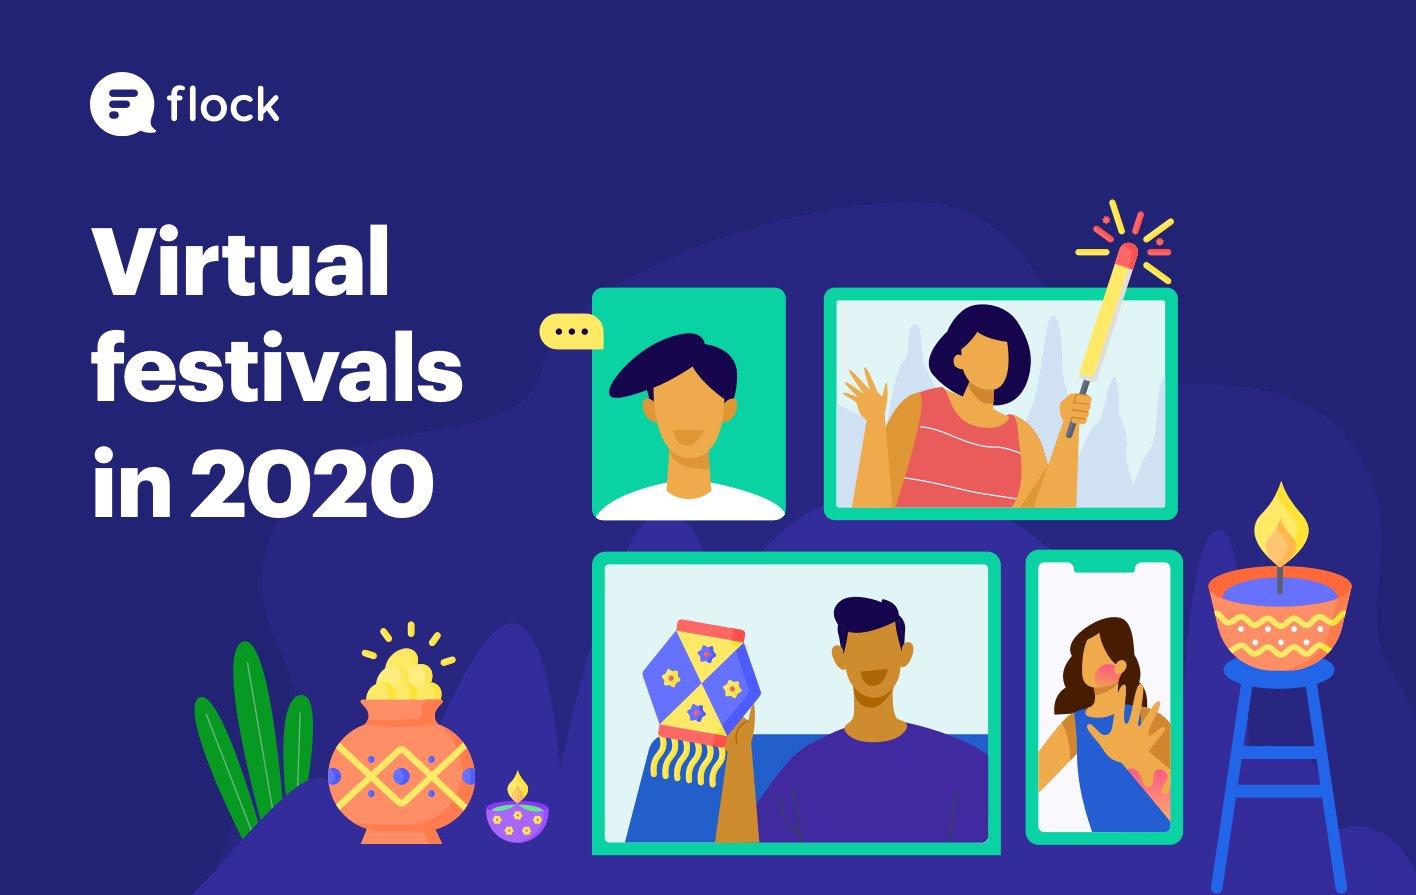 Virtual festivals in 2020